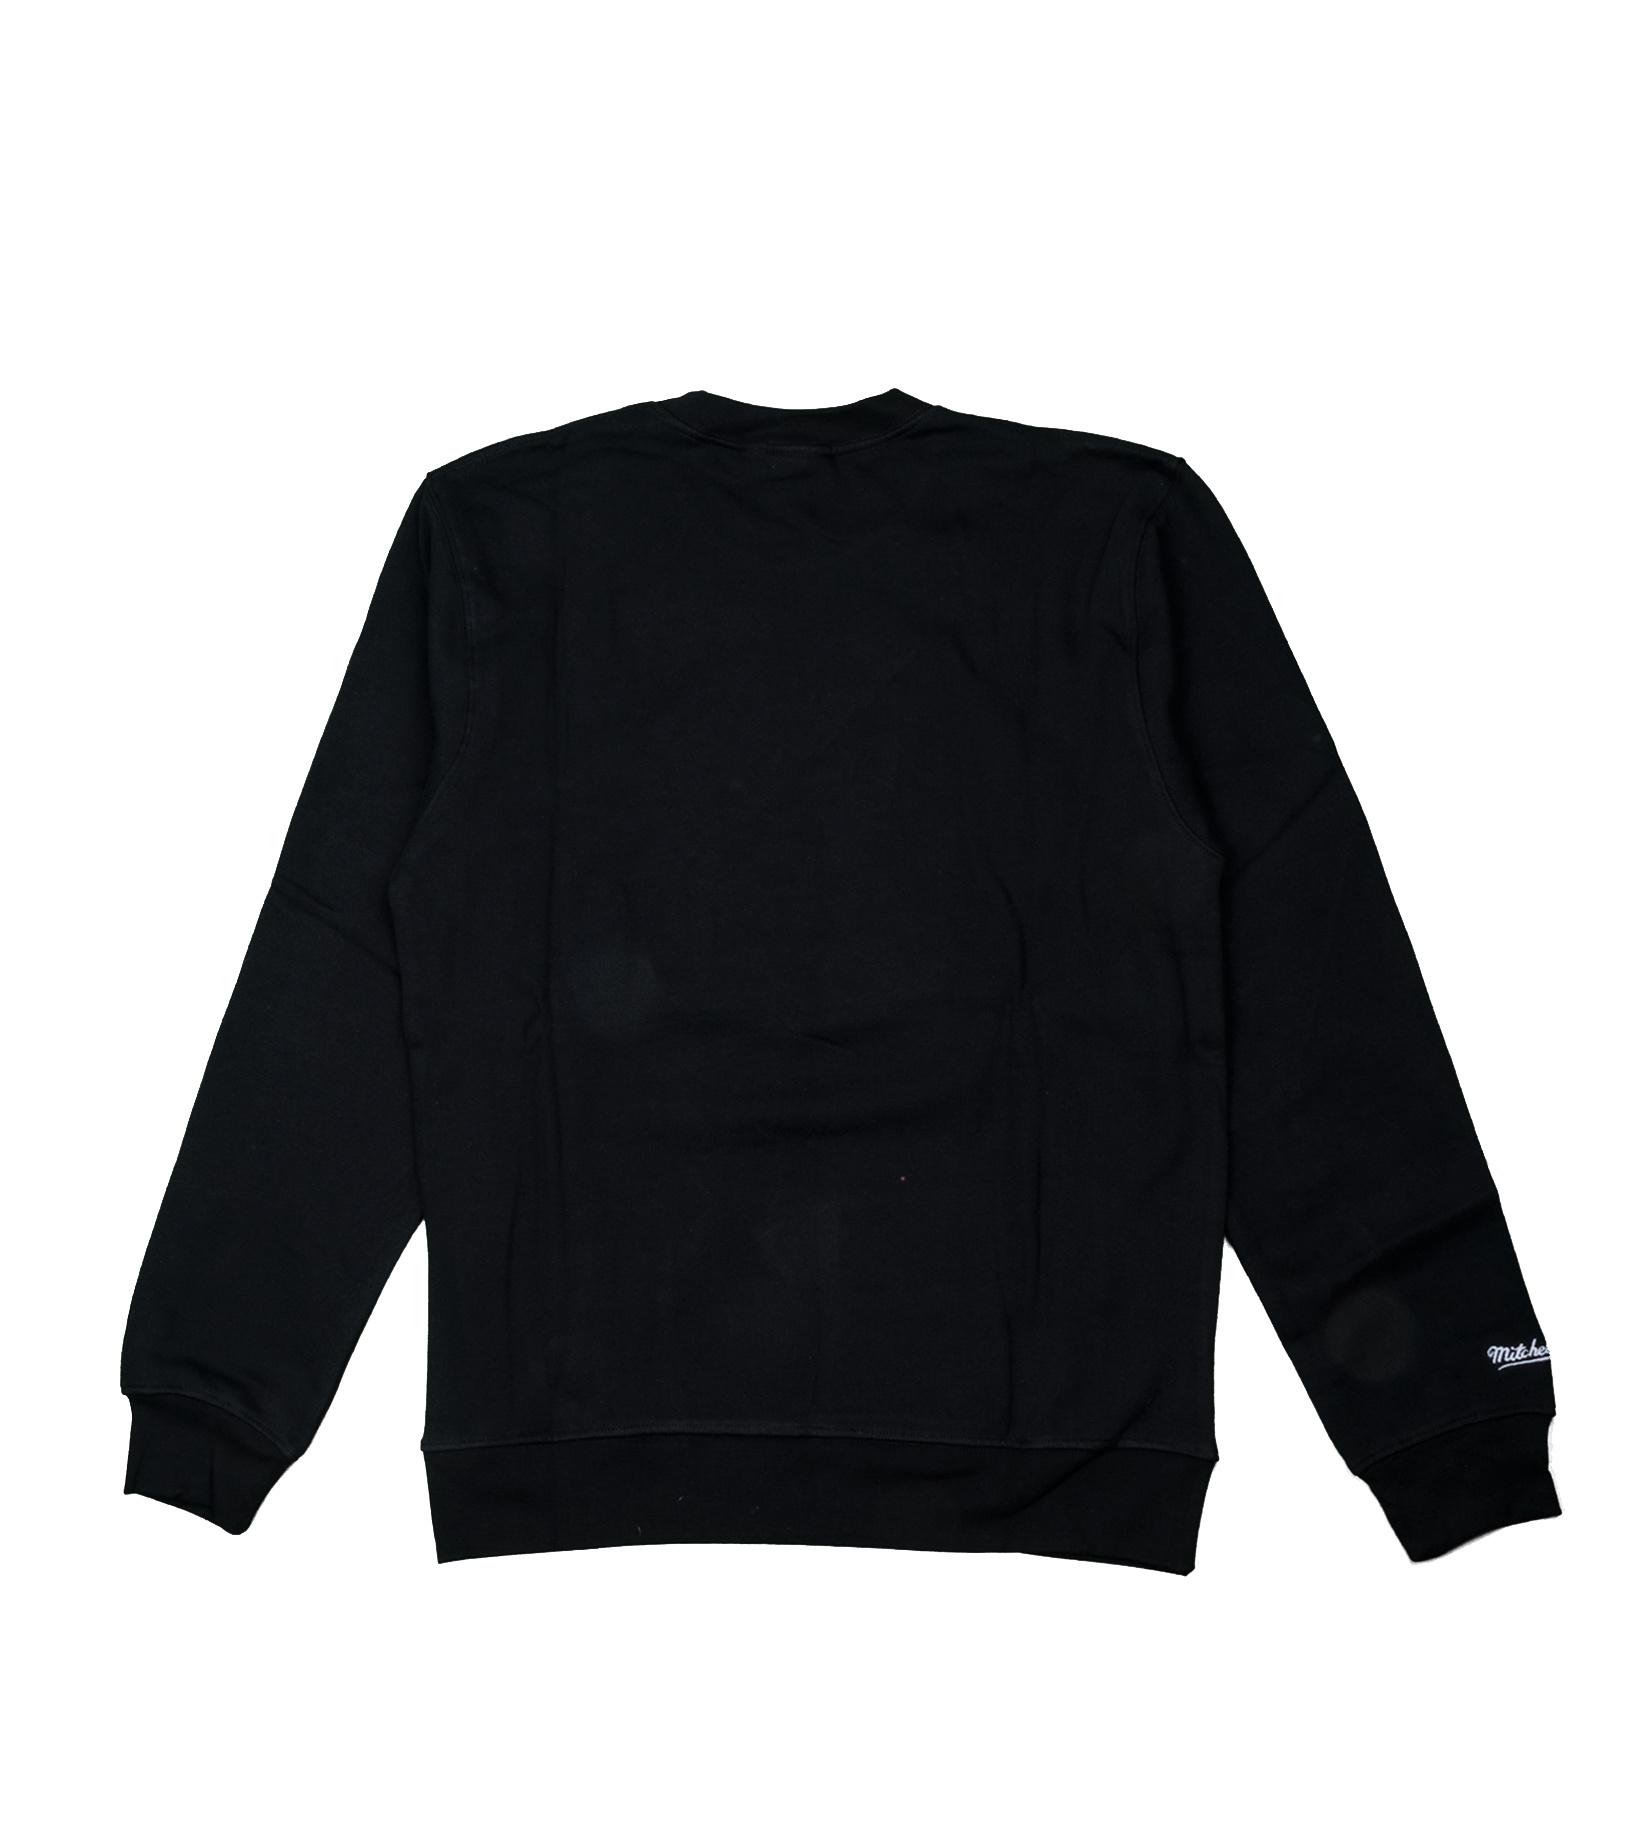 "Toronto Raptors Embroidered Logo Sweatshirt""Black""-5"